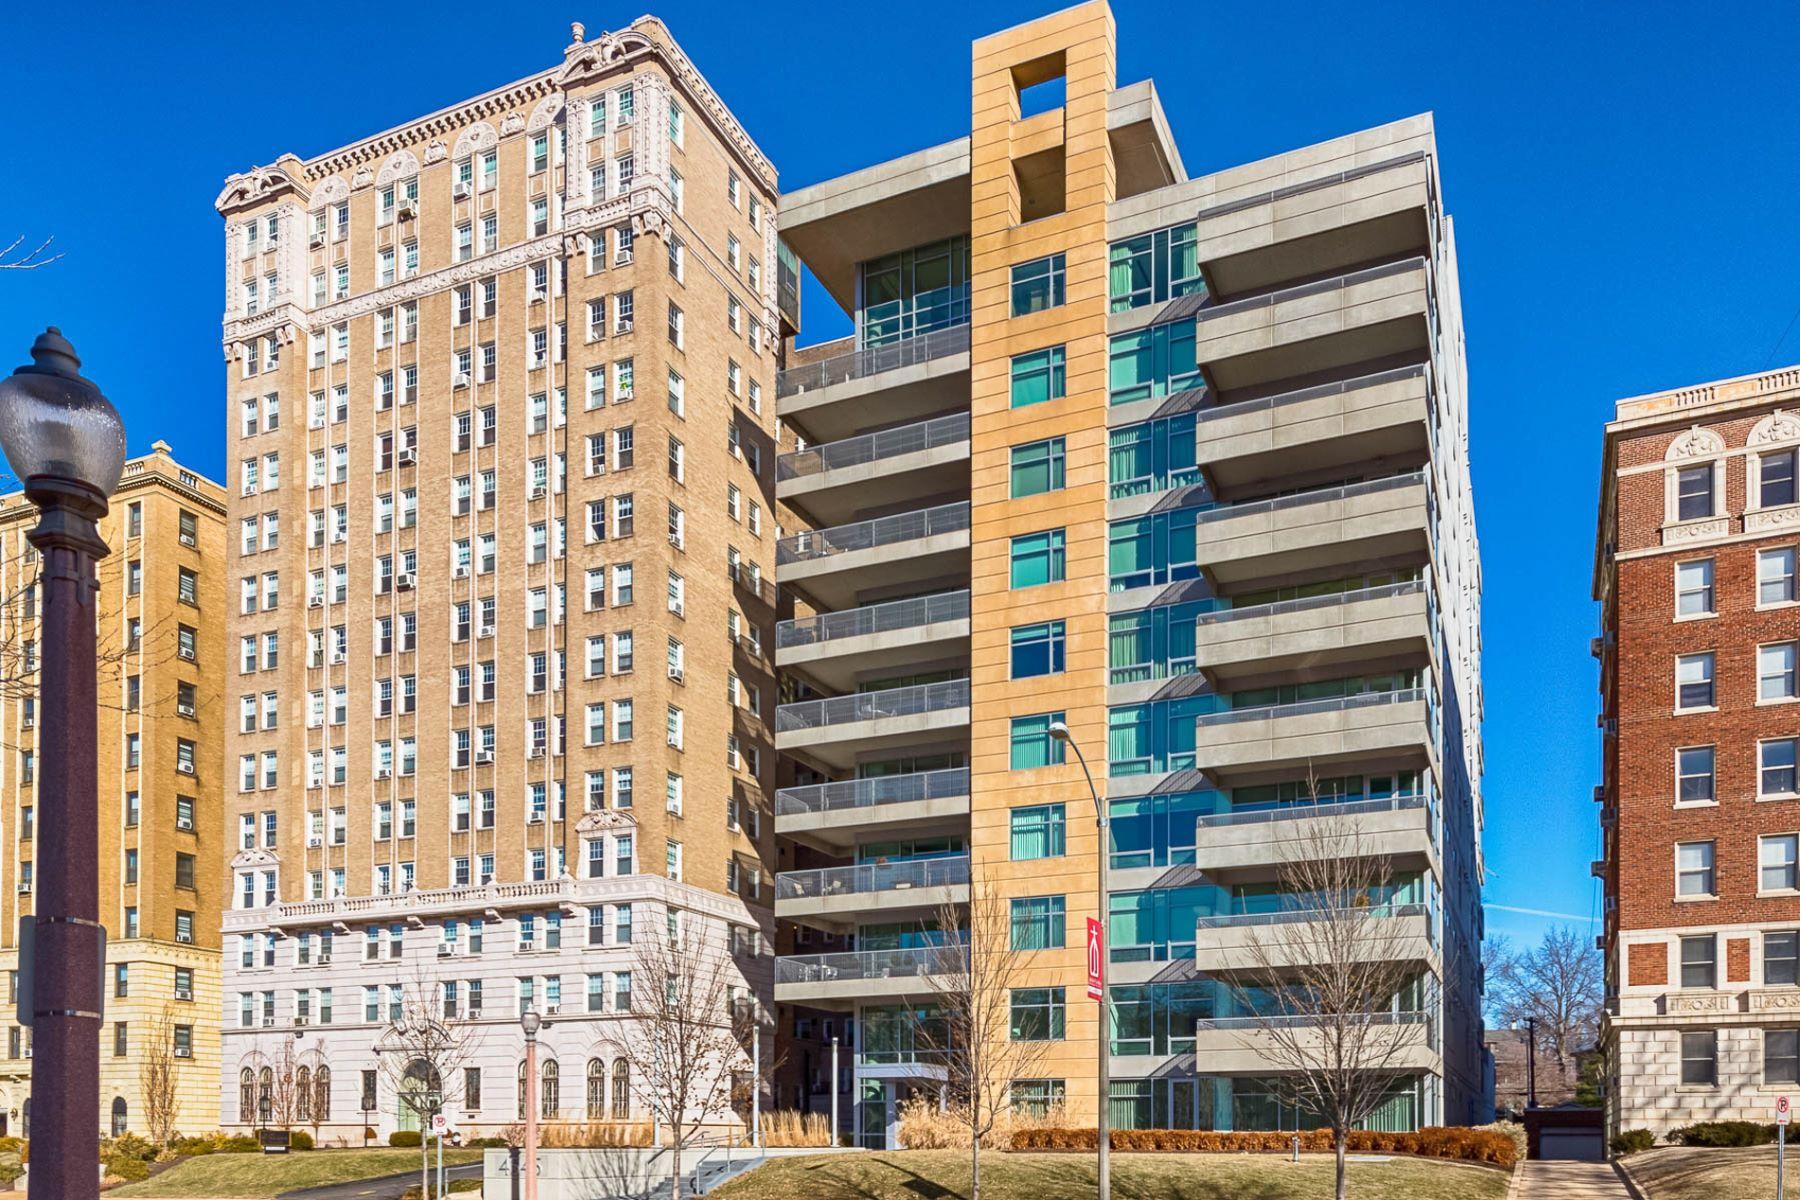 Condominium for Sale at Lindell Blvd 4545 Lindell Blvd # 23 St. Louis, Missouri 63108 United States